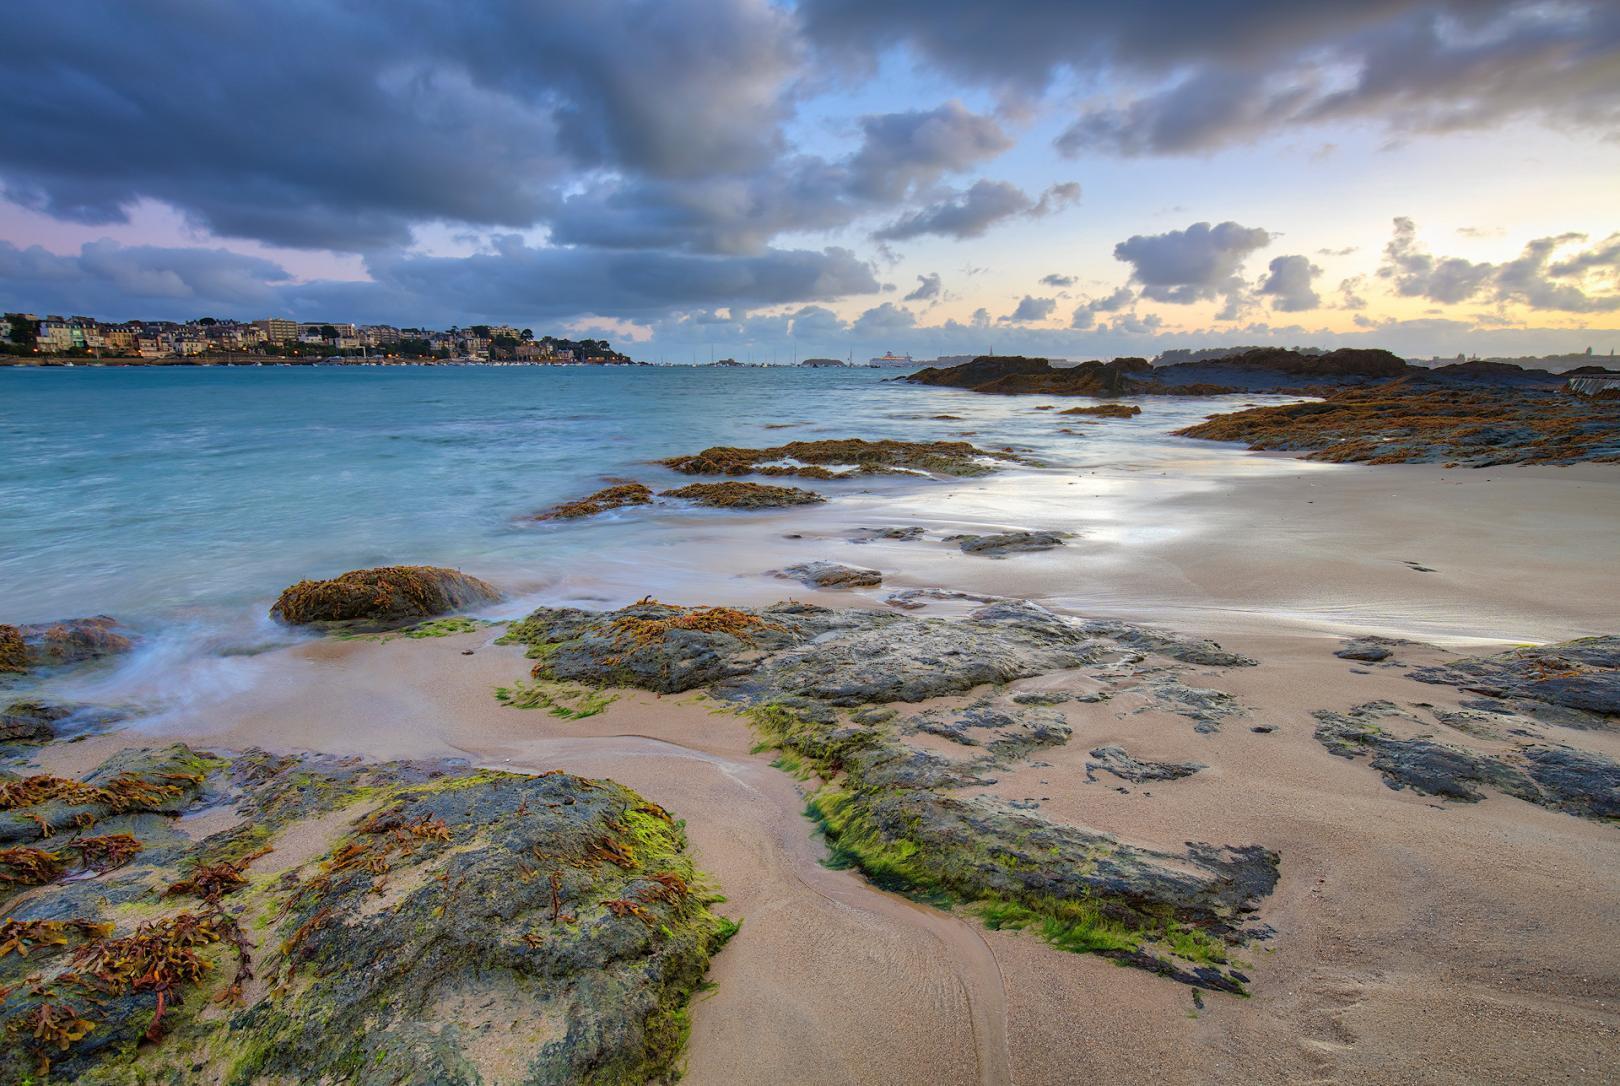 Sunrise at the coast of Dinard - Bretagne, Frankrijk - Canon EOS 6D mark II + Canon EF16-35mm f/4 L IS op 16mm, f/9, 1 sec. en iso100